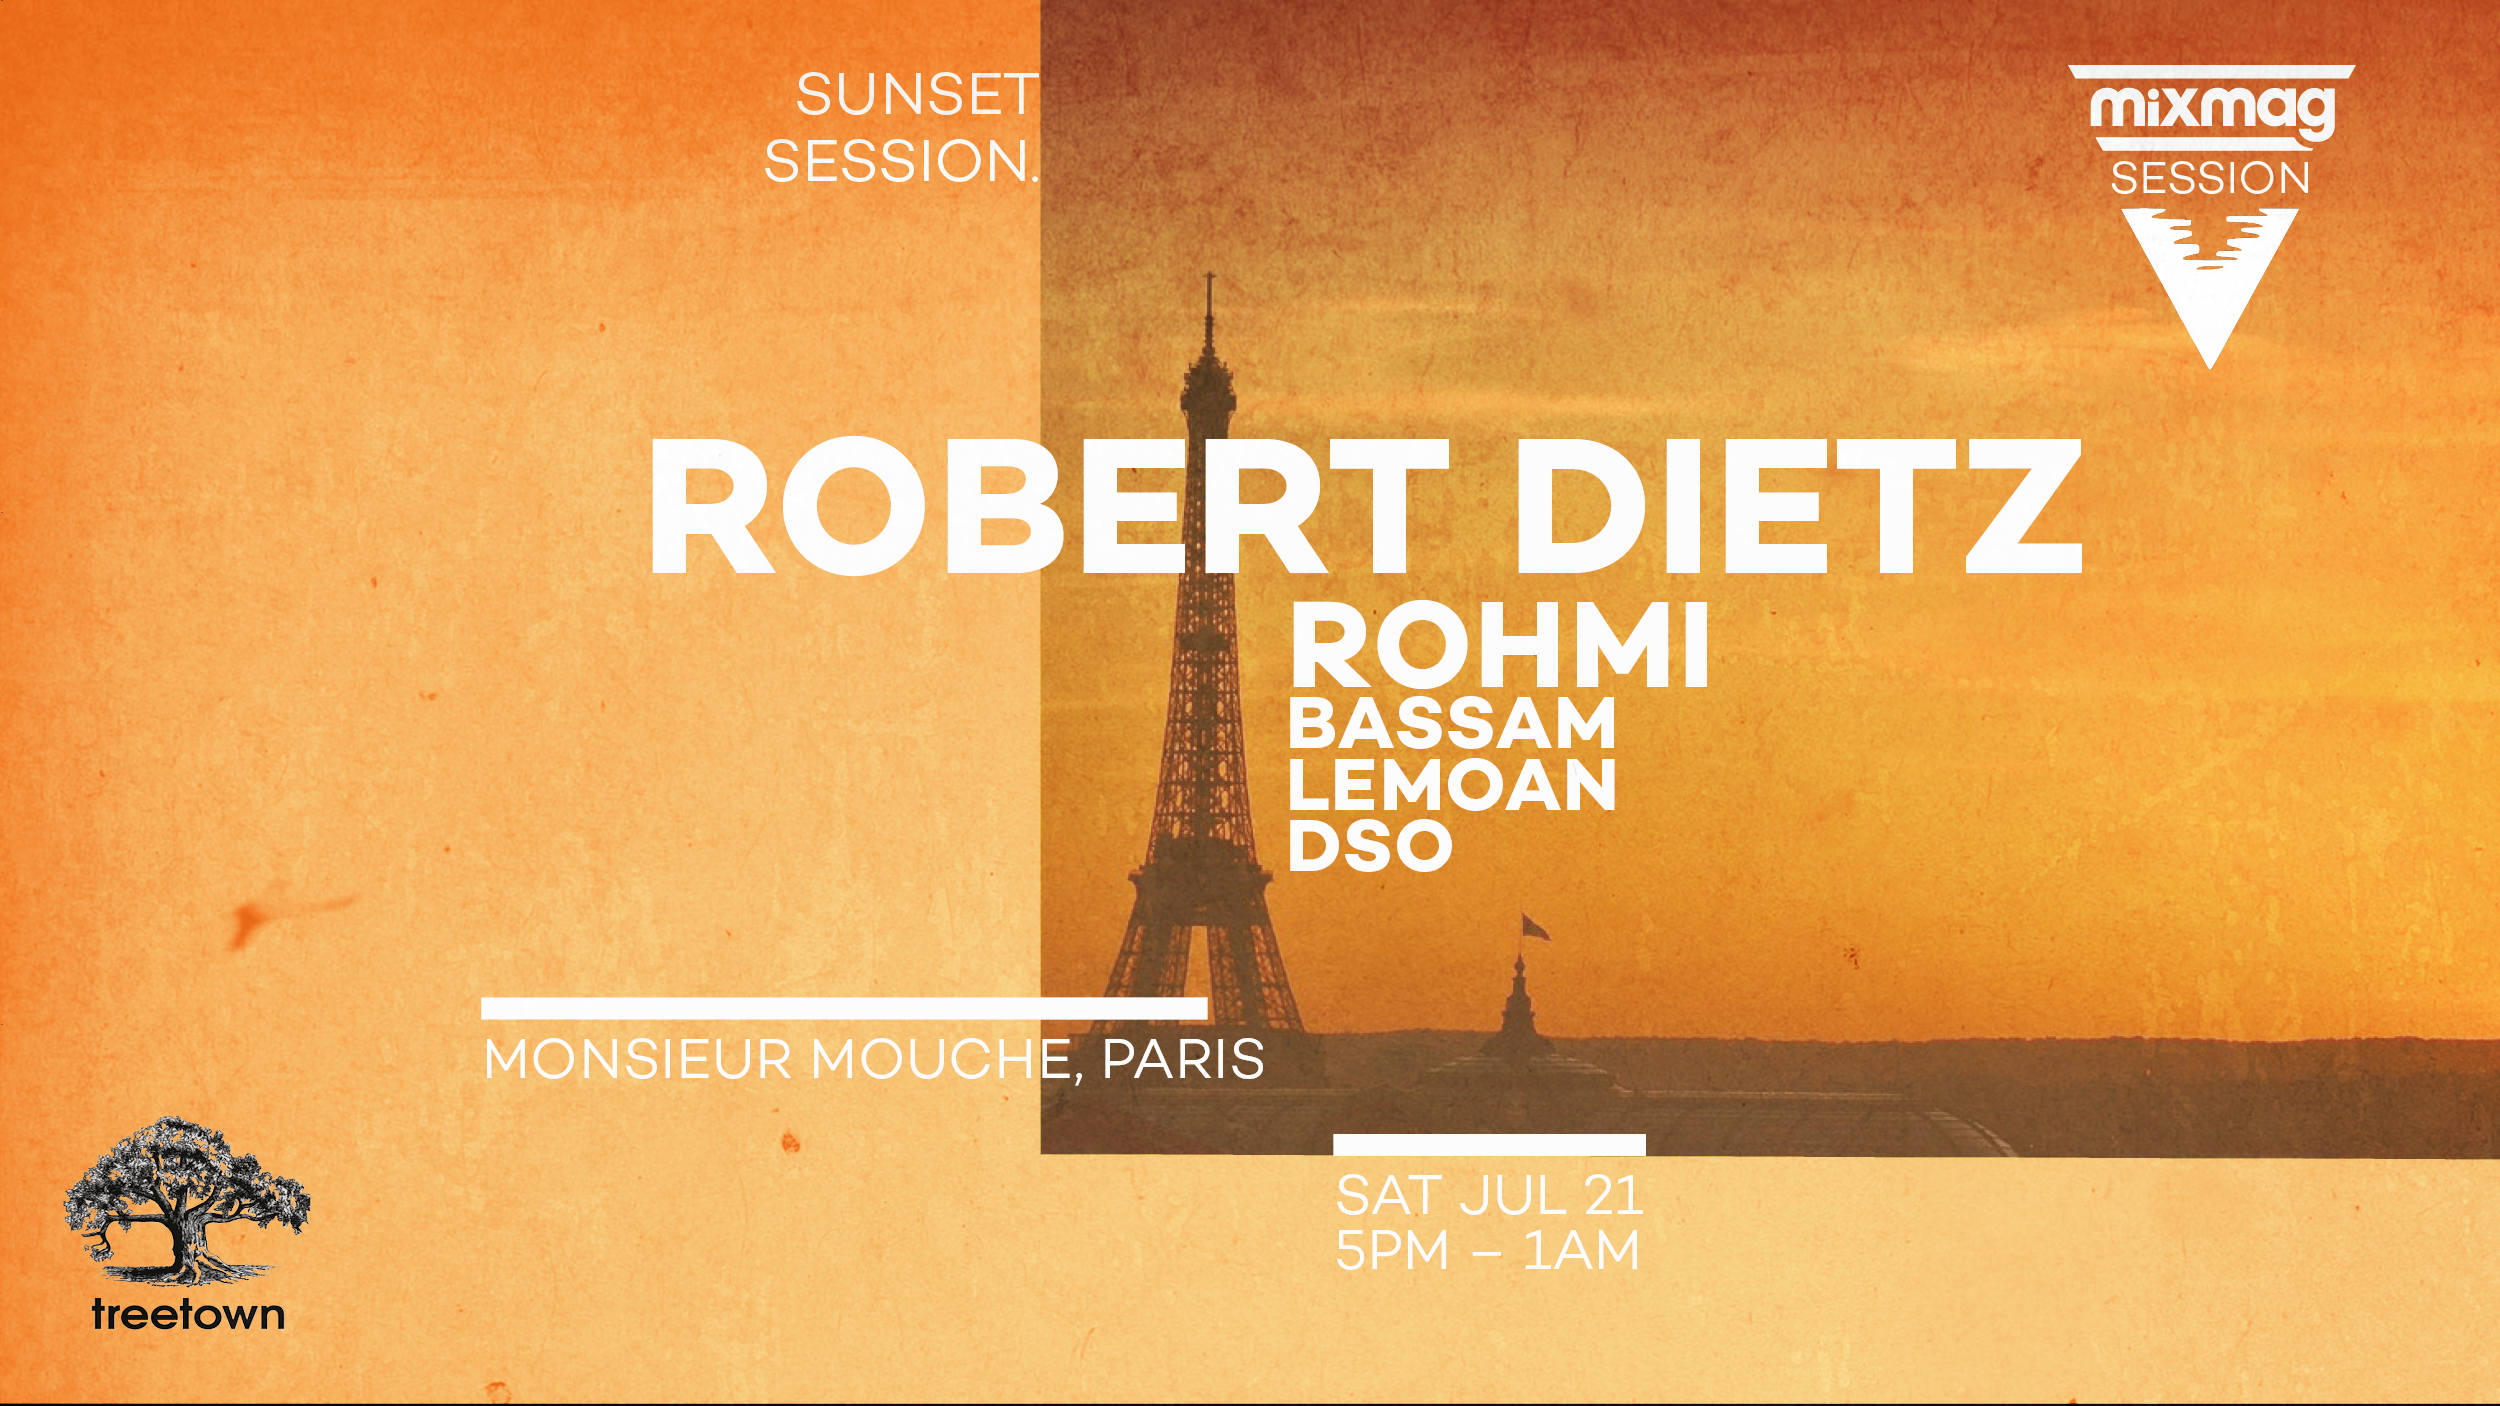 Mixmag x Treetown Sunset Session W/ Robert Dietz